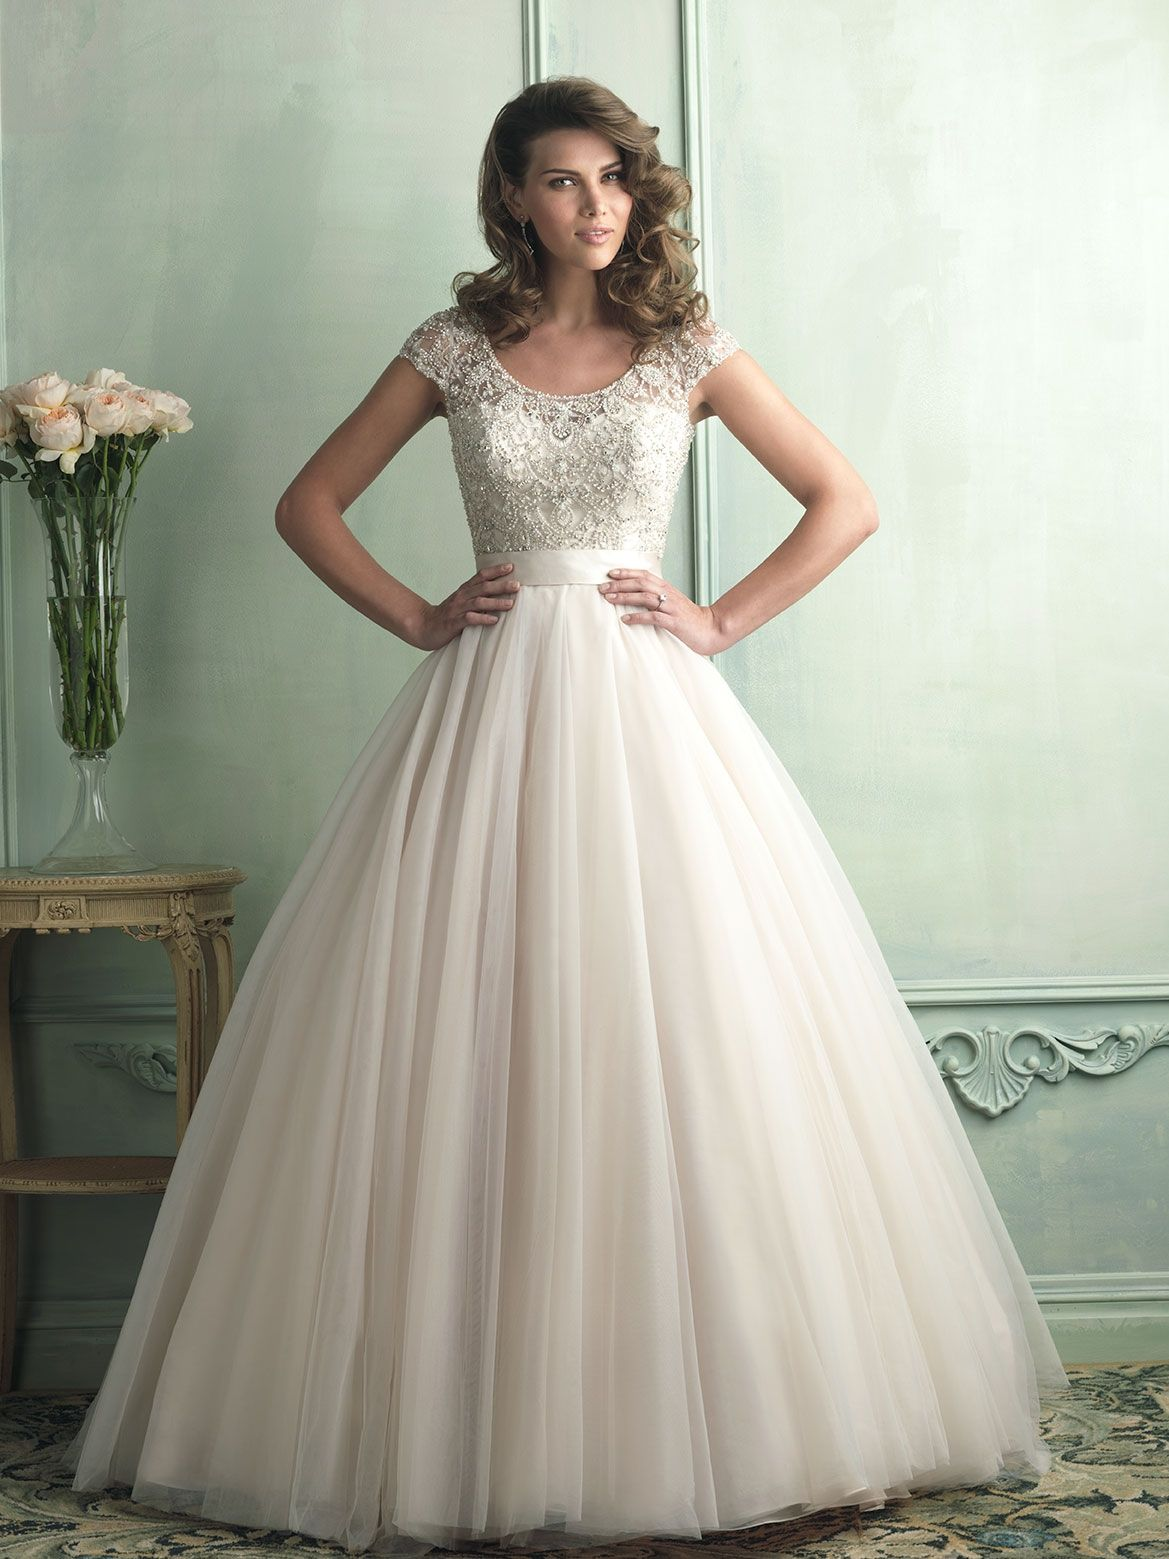 Style allure bridal wedding dress and wedding